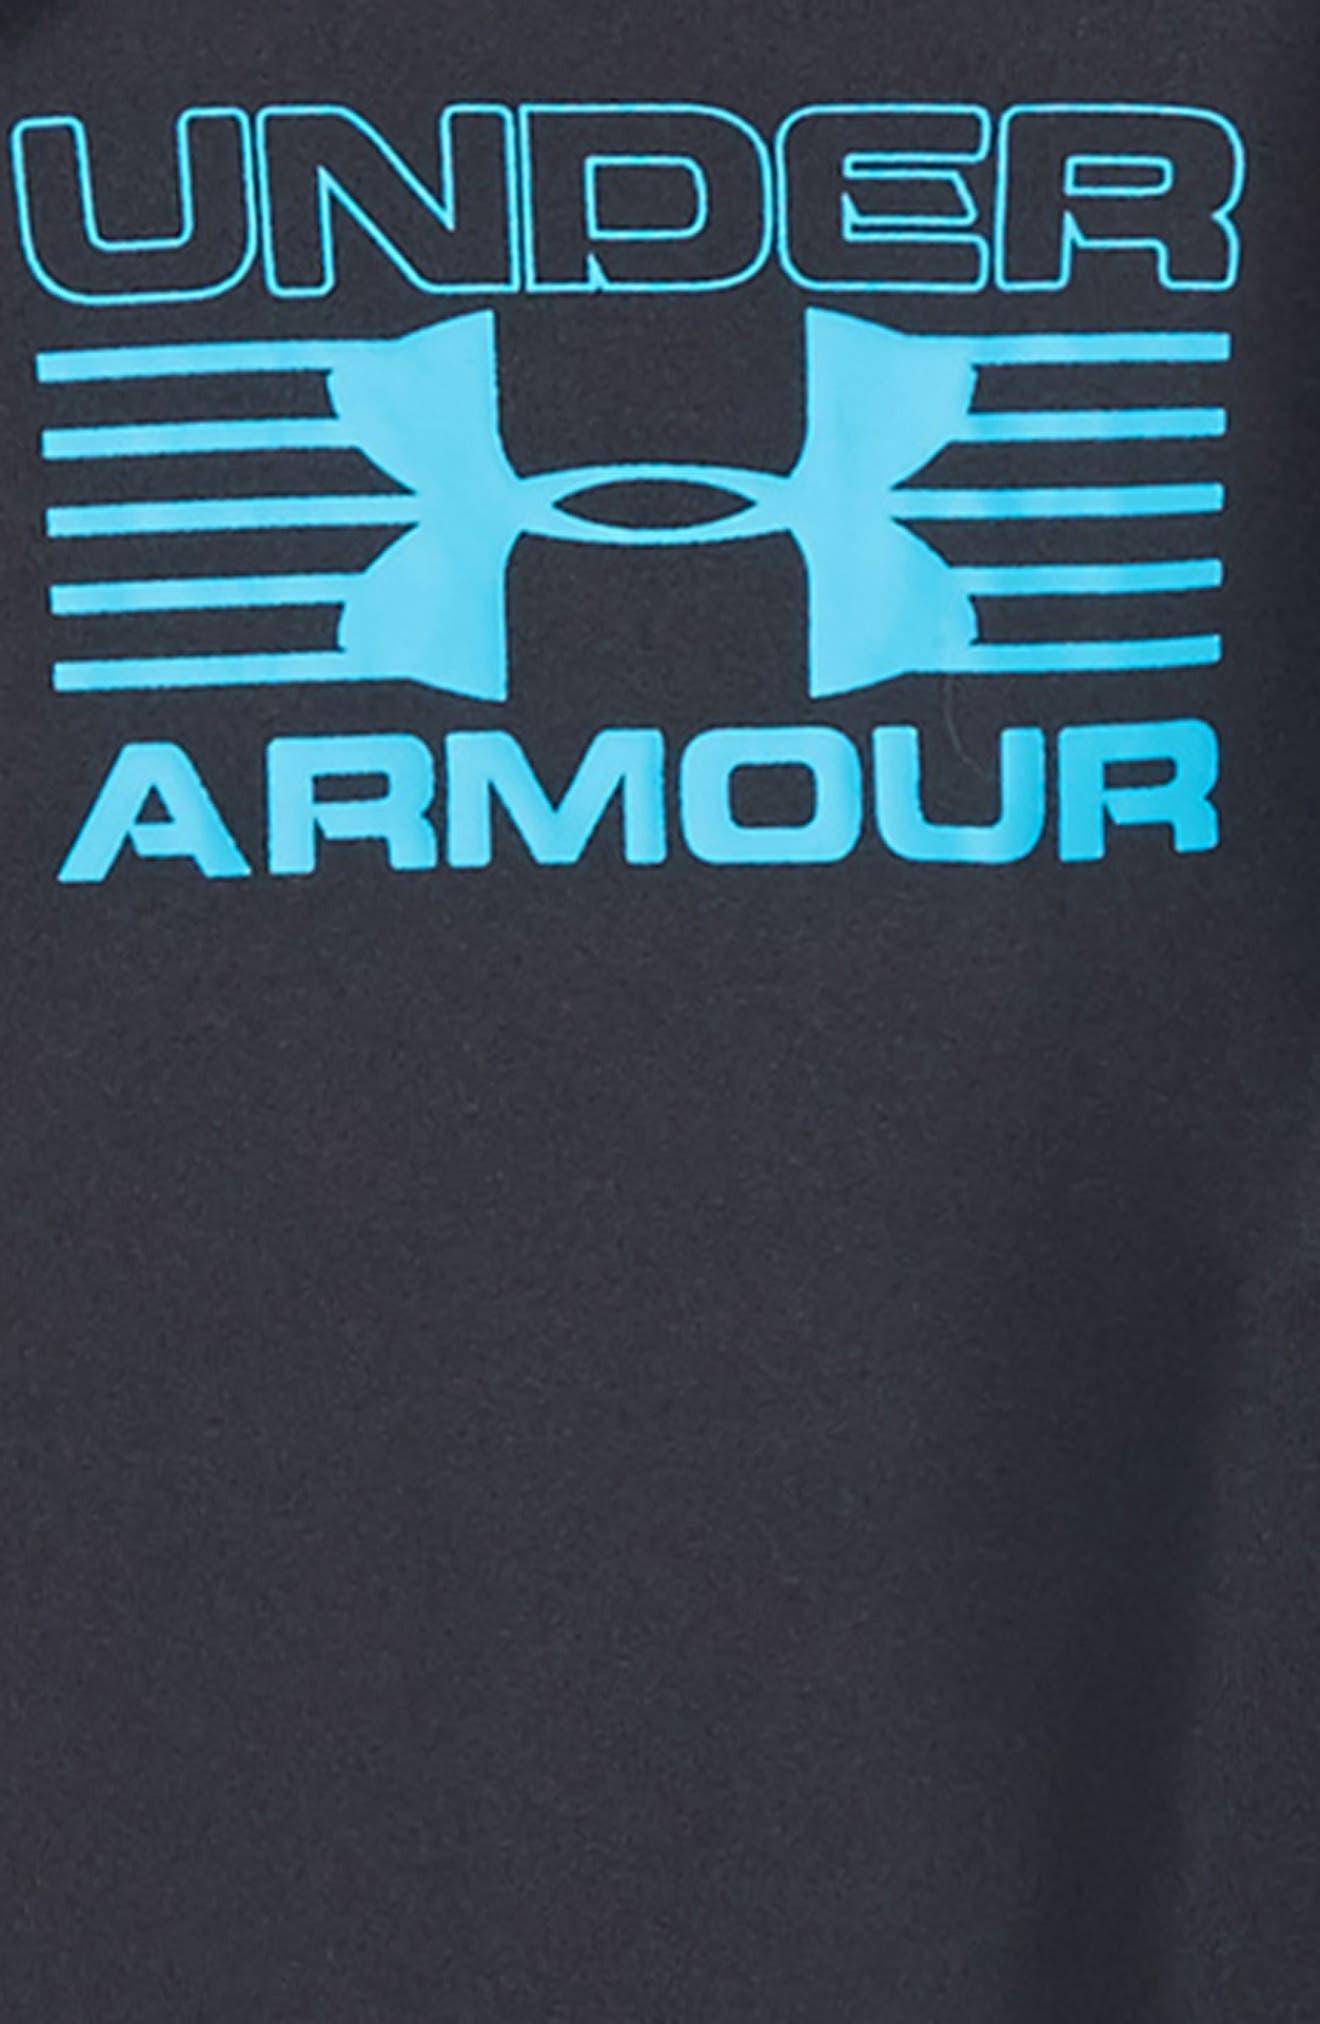 Alternate Image 2  - Under Armour Hooded T-Shirt (Toddler Boys & Little Boys)